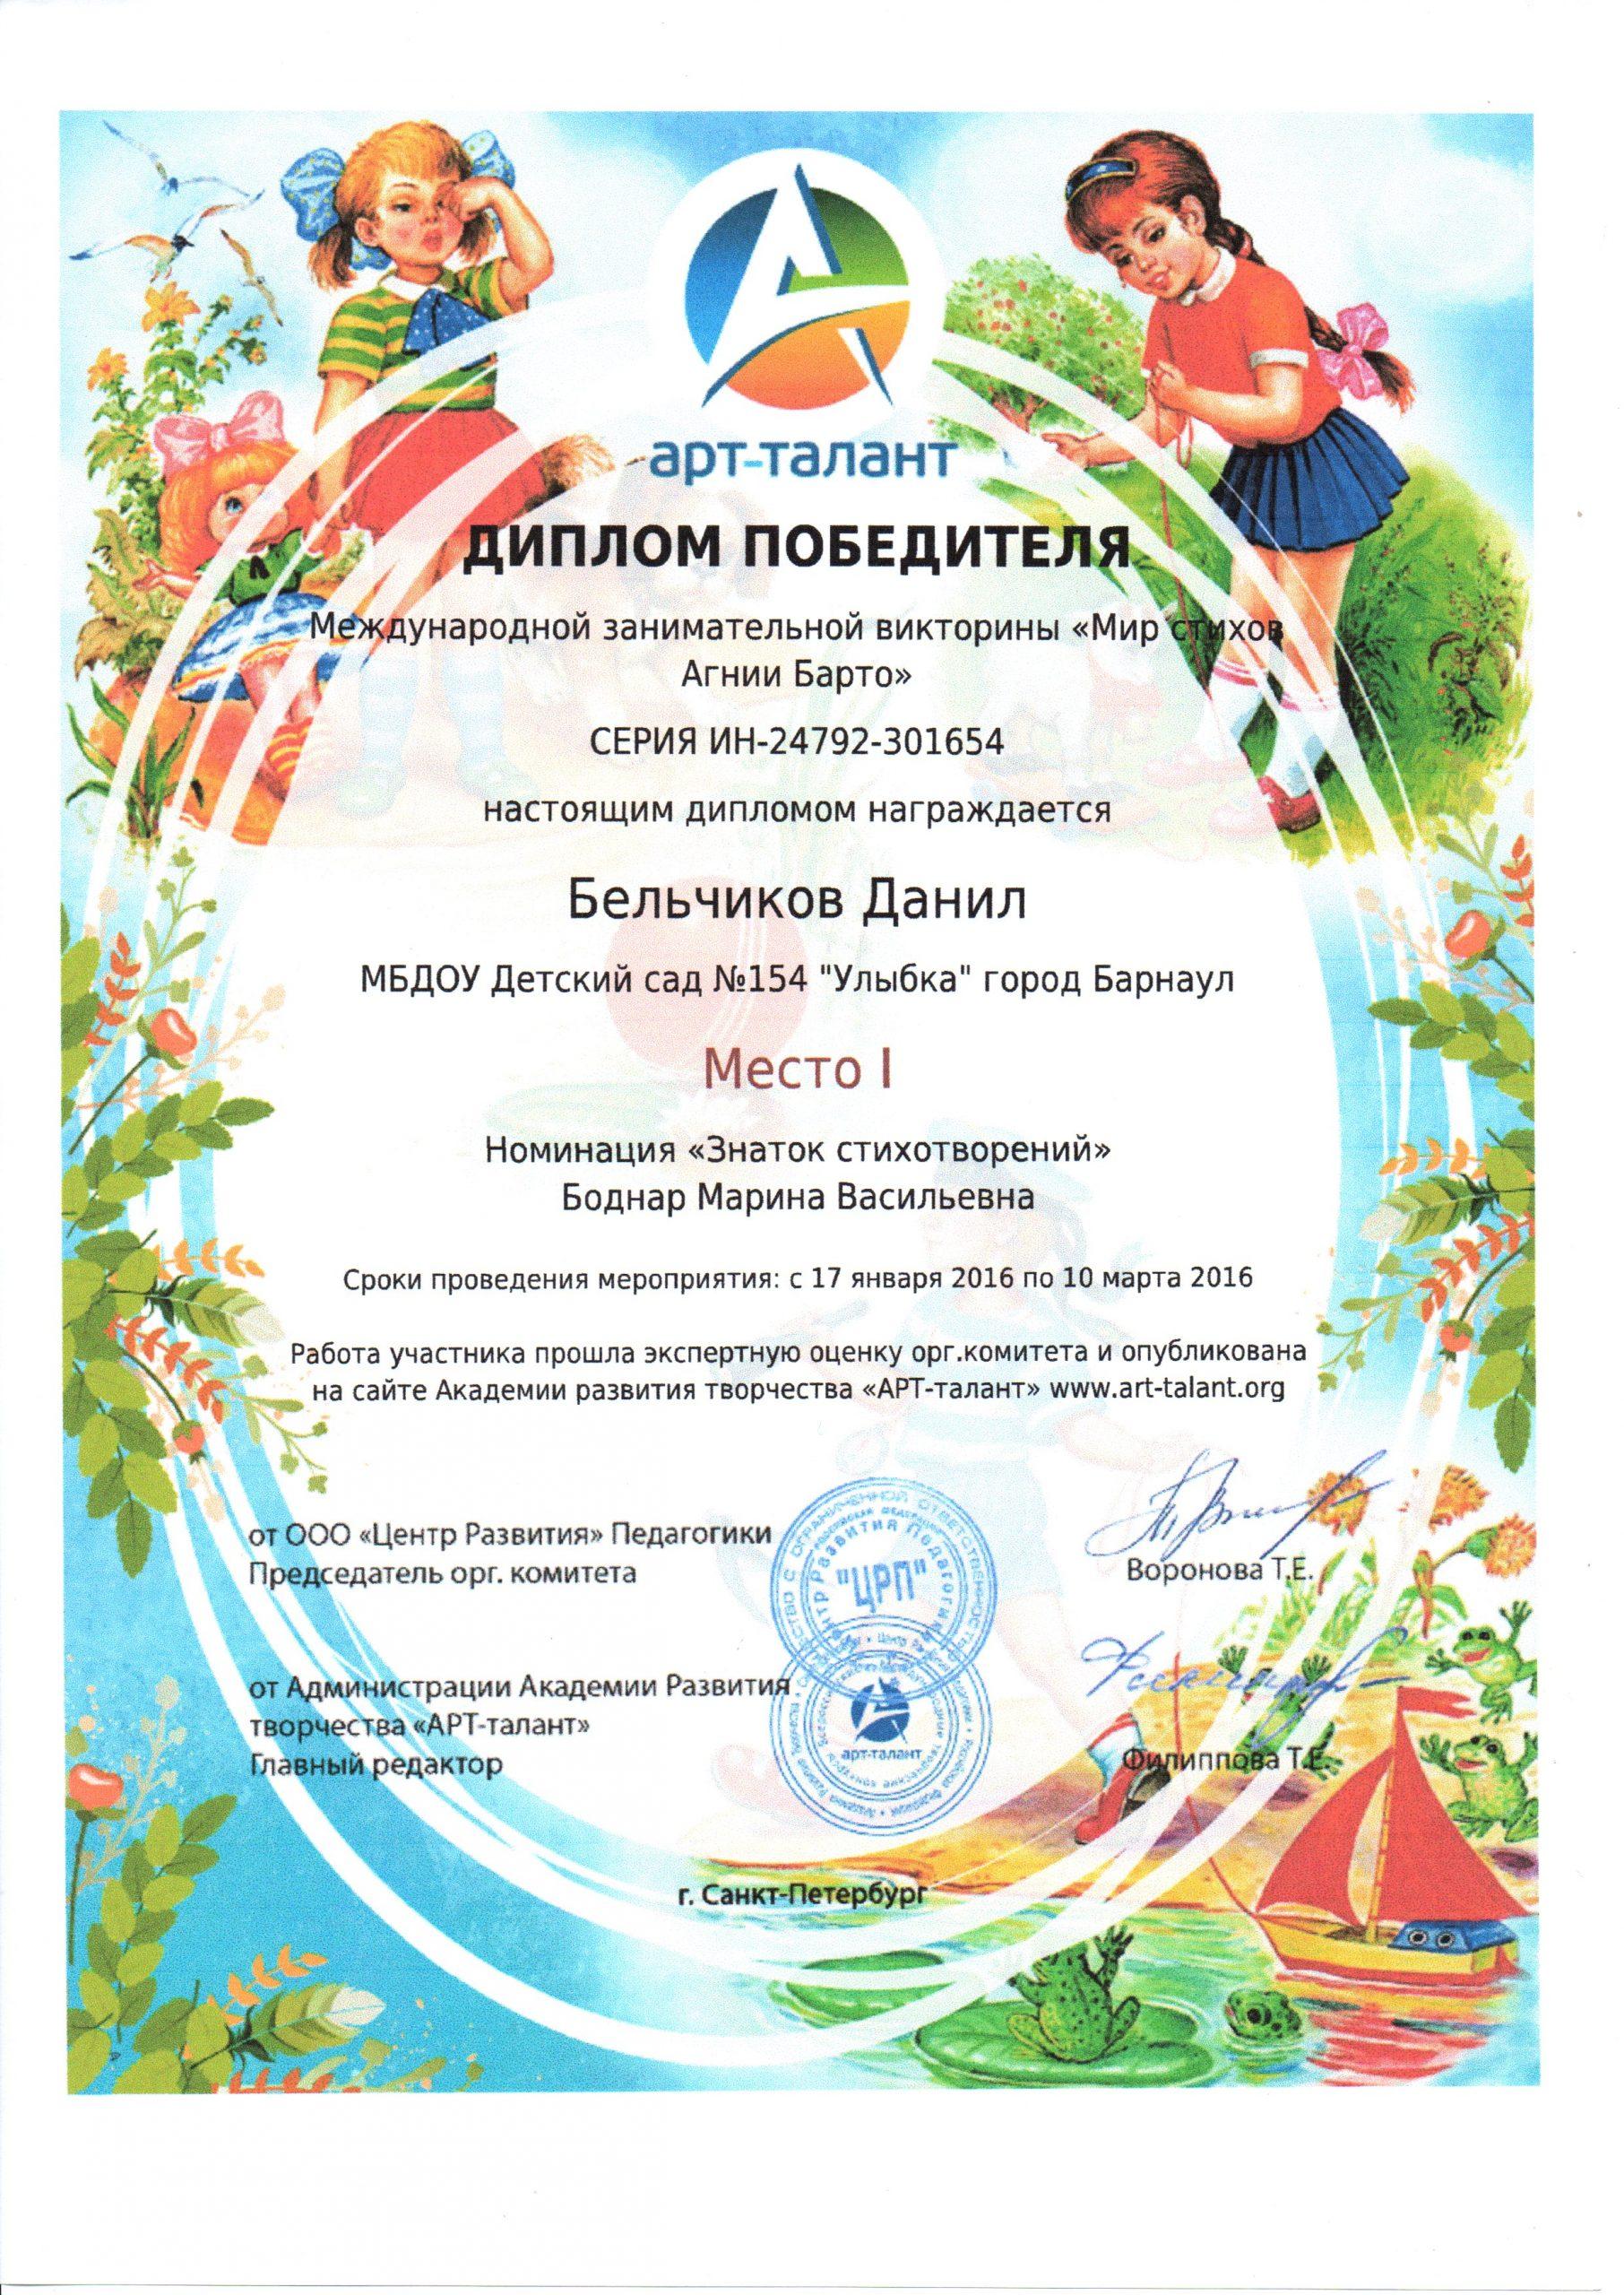 img20200915_12474024